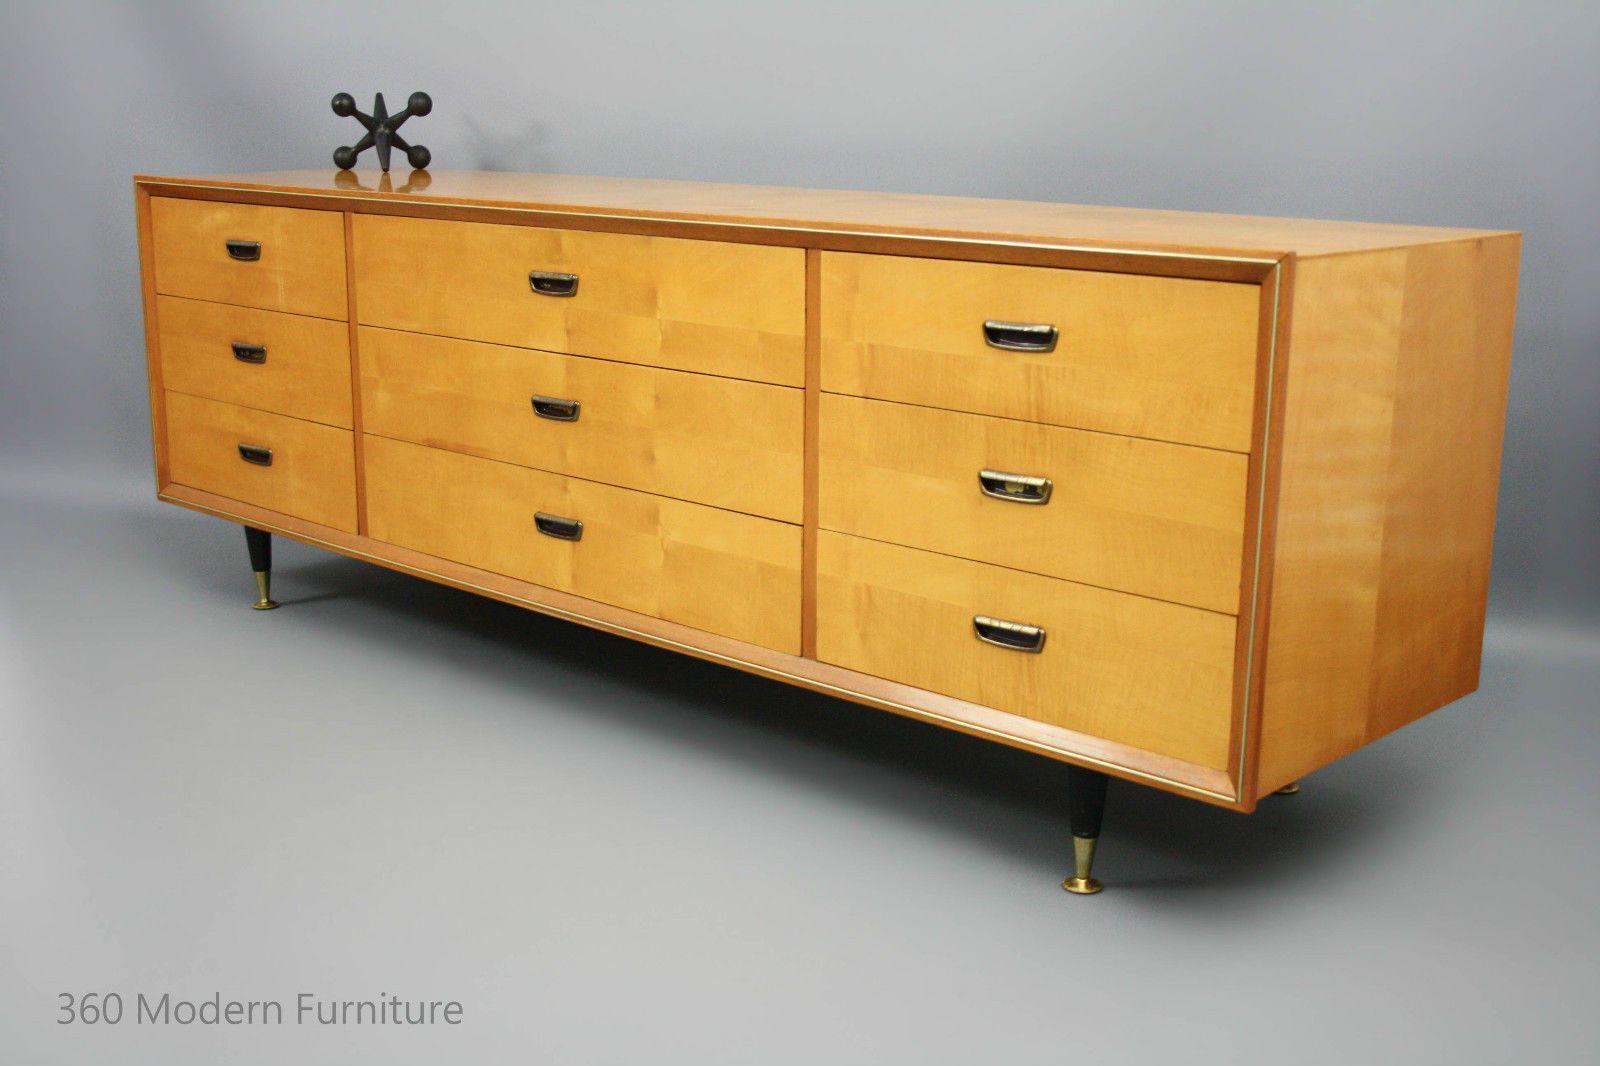 MID Century Modern Sideboard Drawers Blondewood Lowboy Retro Vintage Danish  Era In VIC | 360 Modern